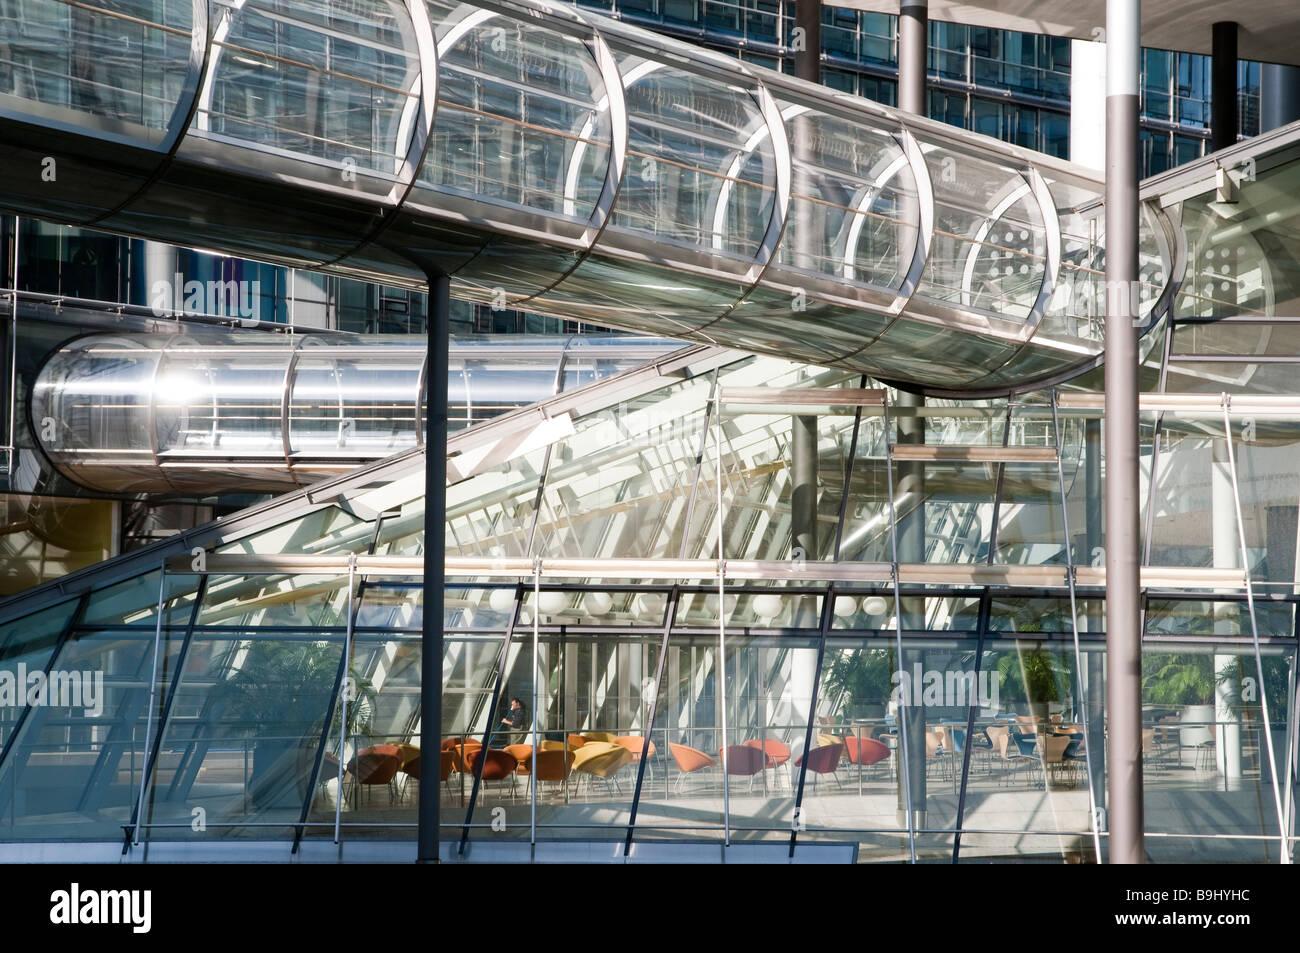 Moderne Architektur In Hannover Foto Bild: Modern Architektur Stock Photos & Modern Architektur Stock